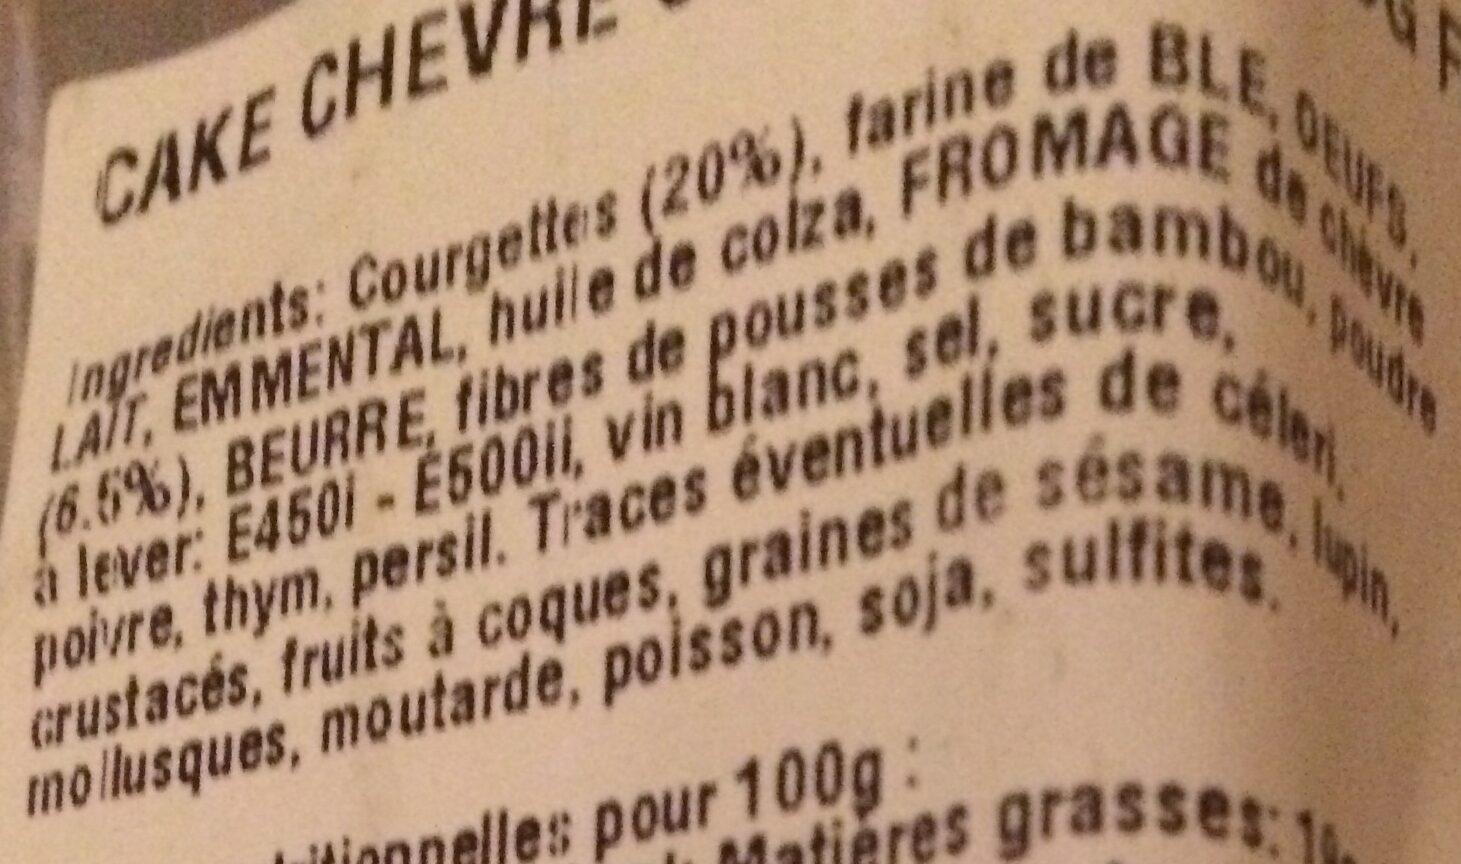 Cake au chèvre et courgette GUYADER - Ingrédients - fr